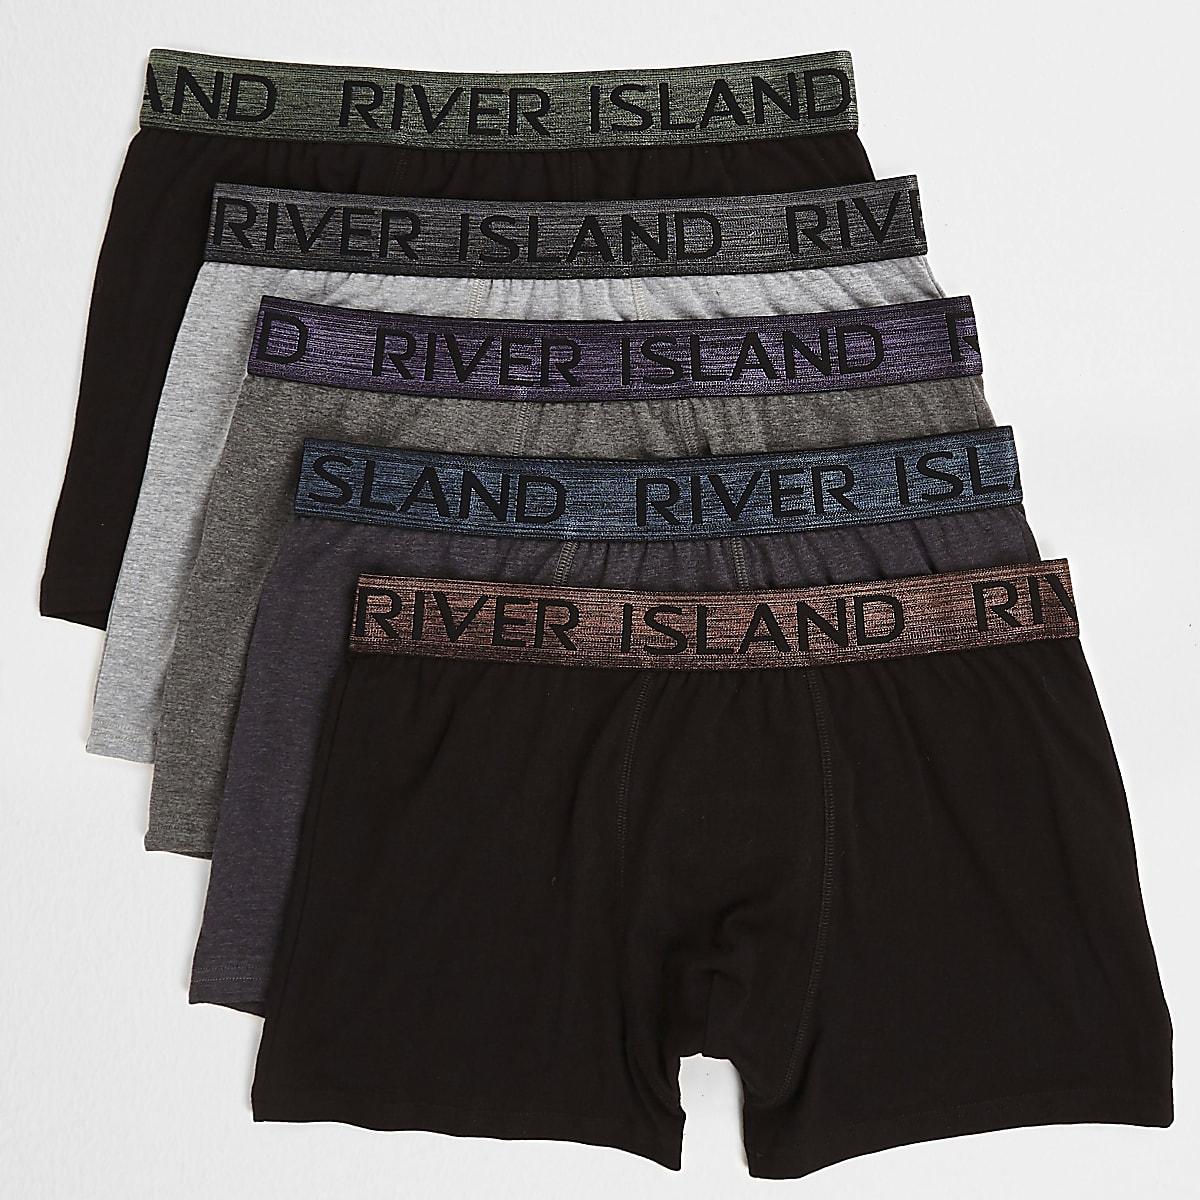 Big and Tall - Set van 5 zwarte metallic strakke boxers